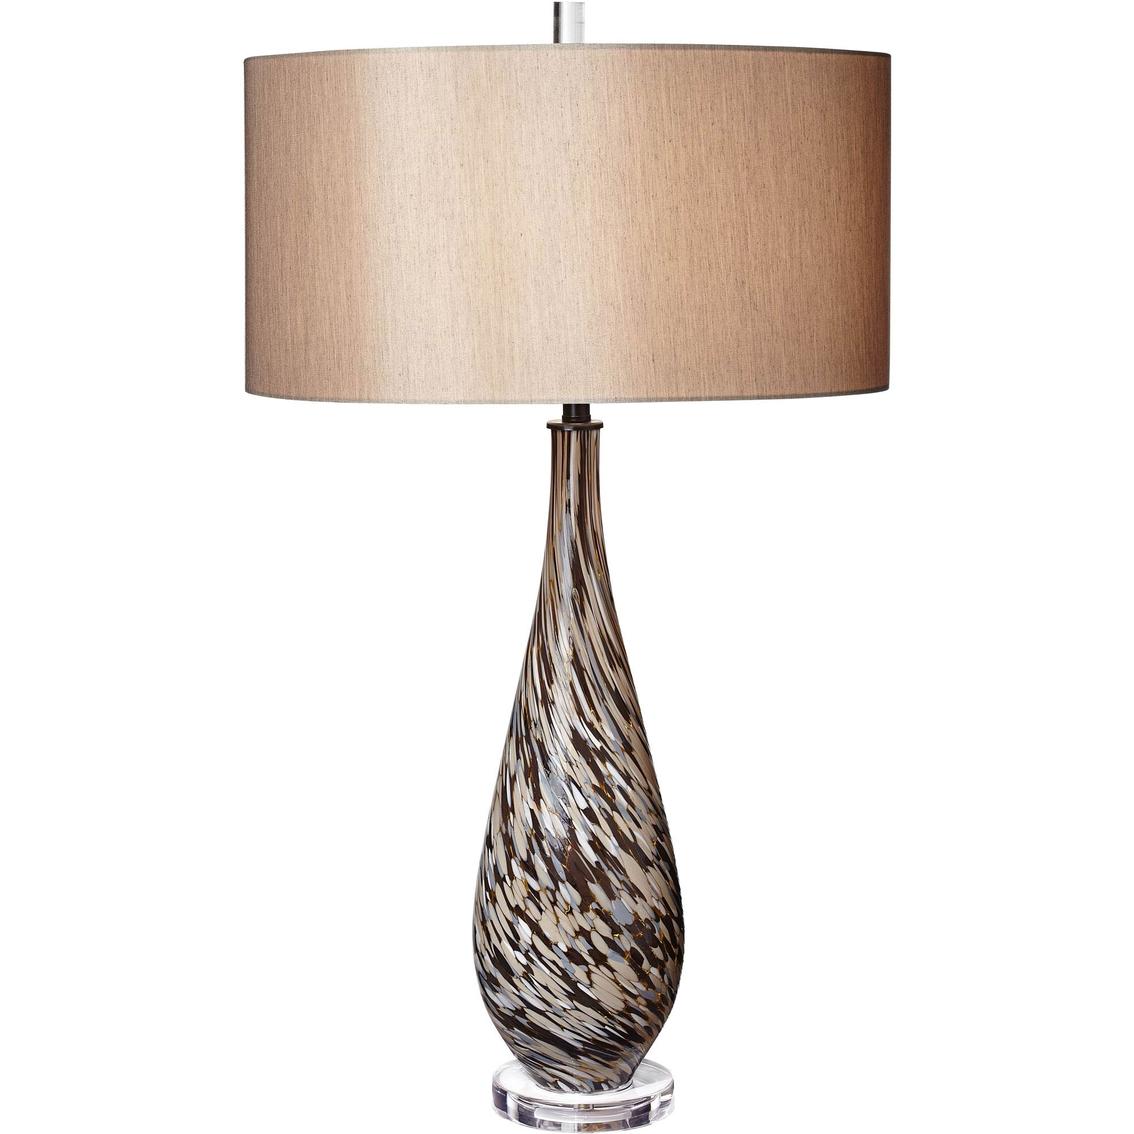 Pacific coast lighting mocha swirl art glass table lamp table 2141 aloadofball Images